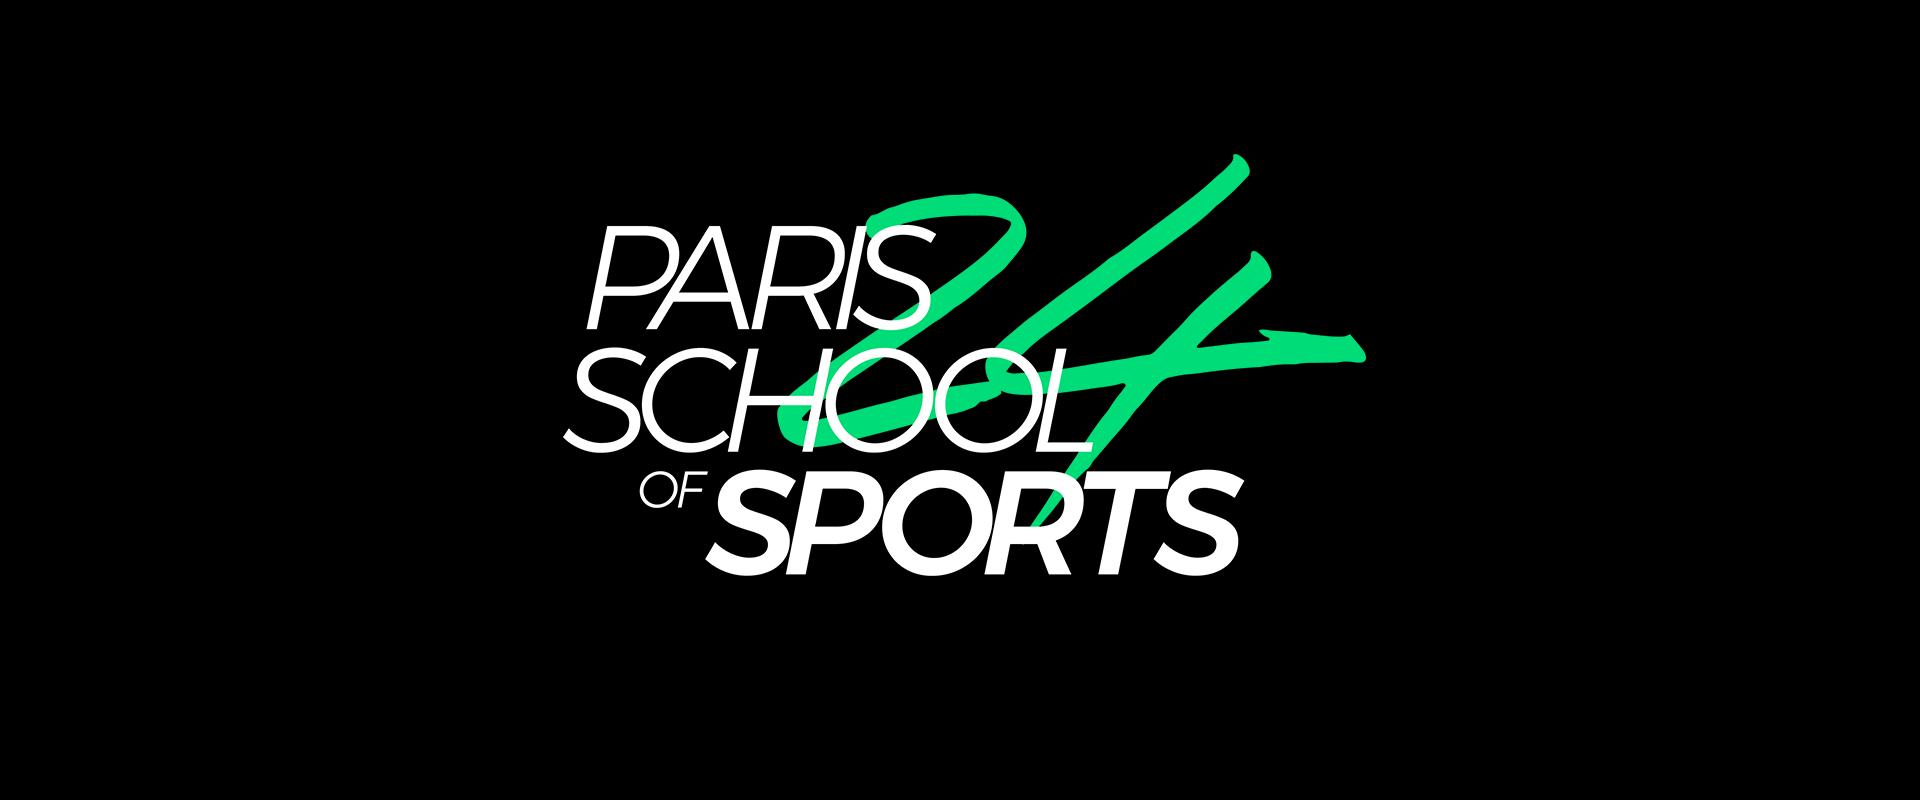 Paris School of Sports : Marketing, communication, management